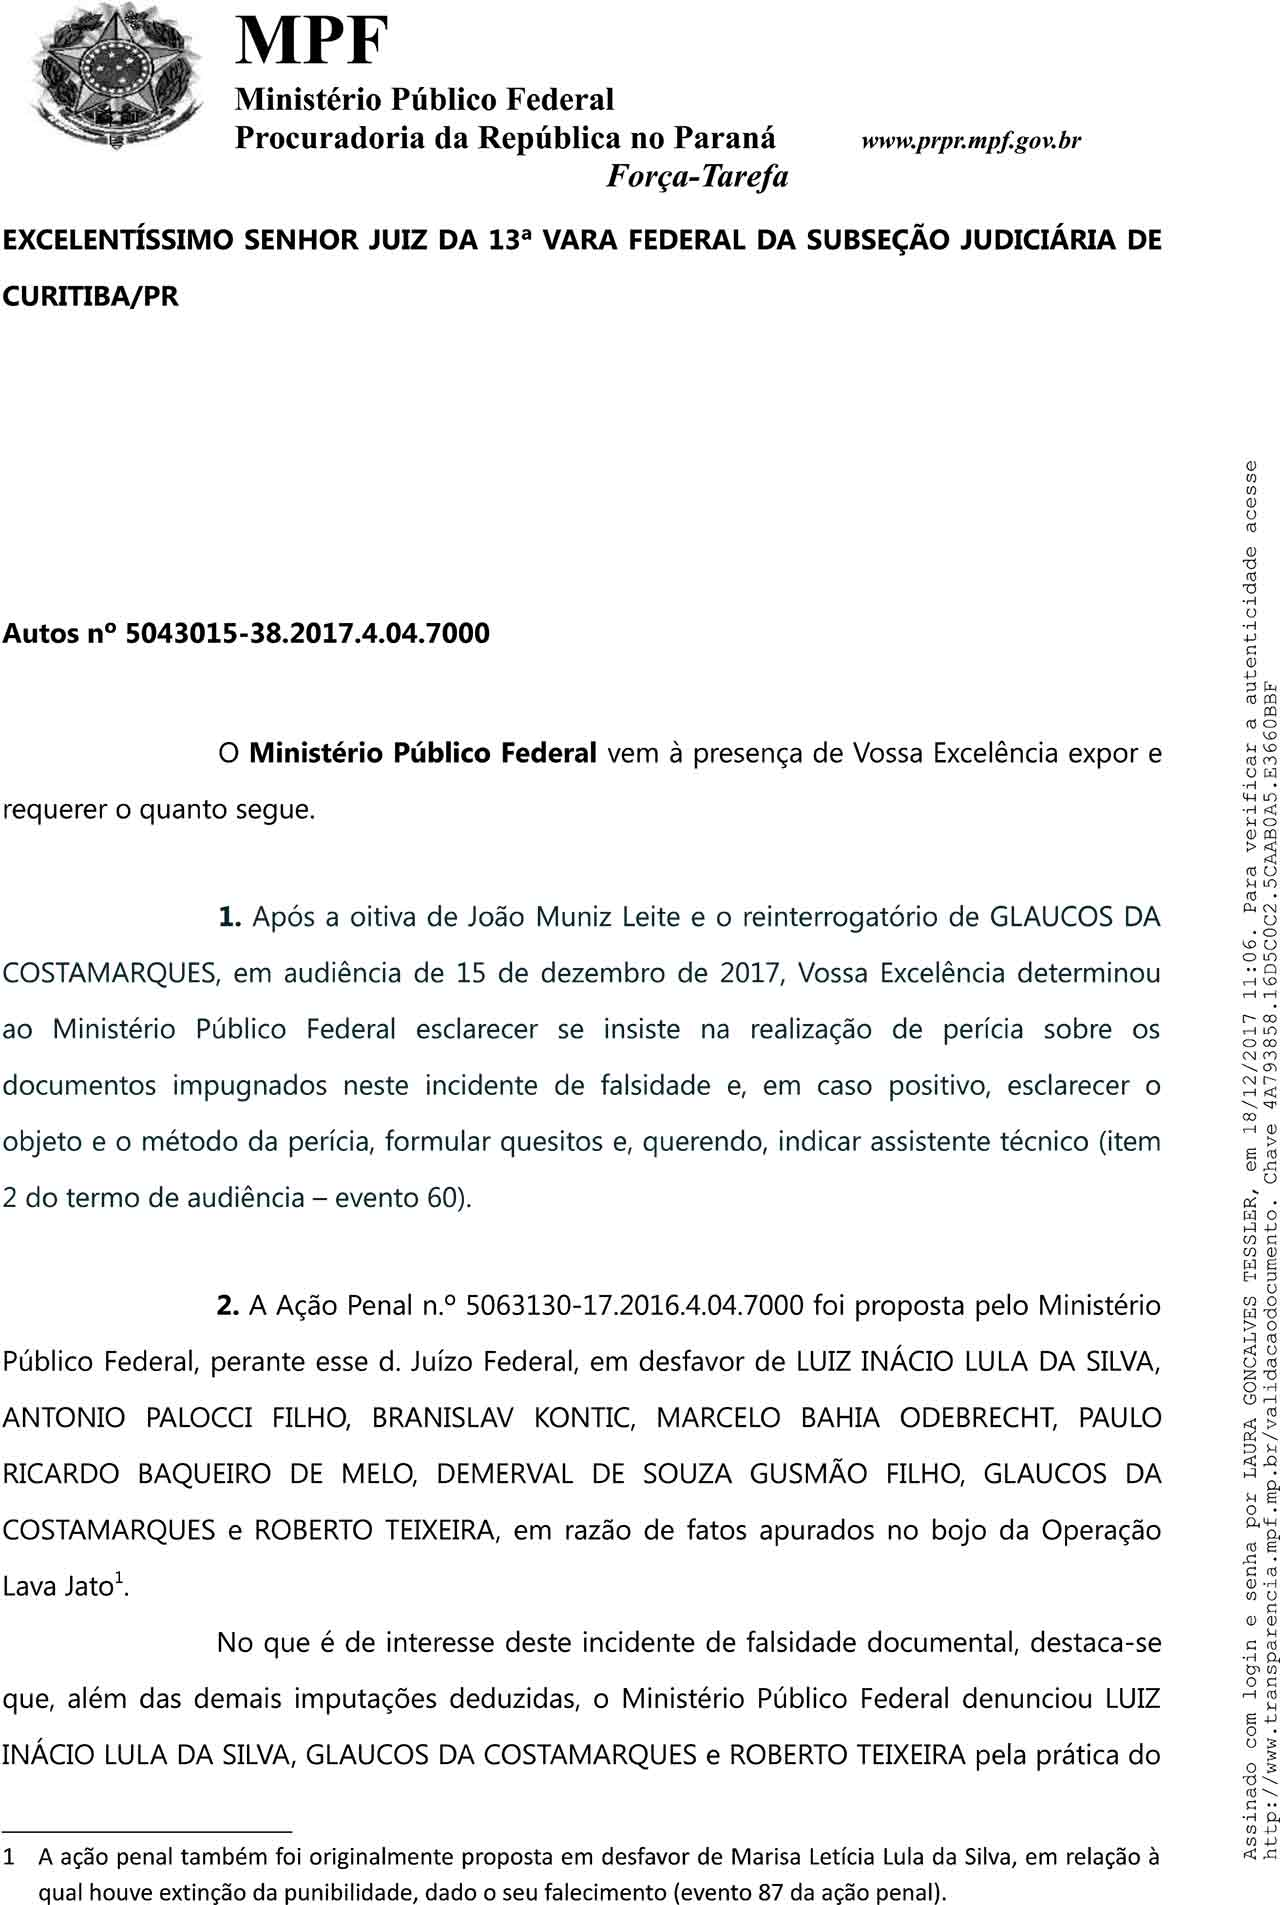 MPF Lula recibos